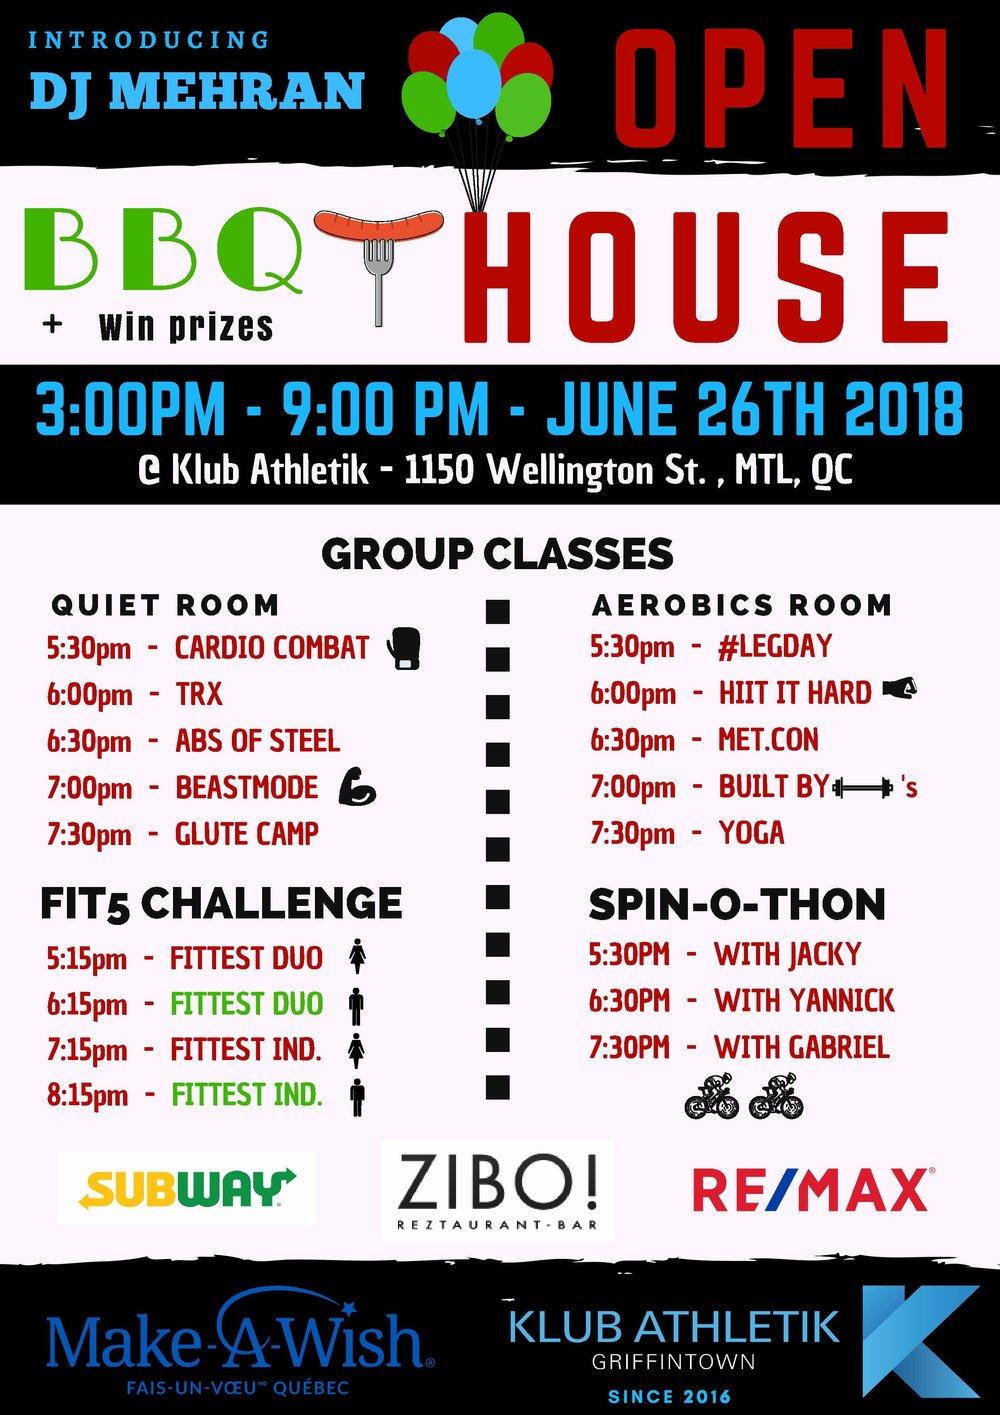 Open house gym Klub Athletik Griffintown